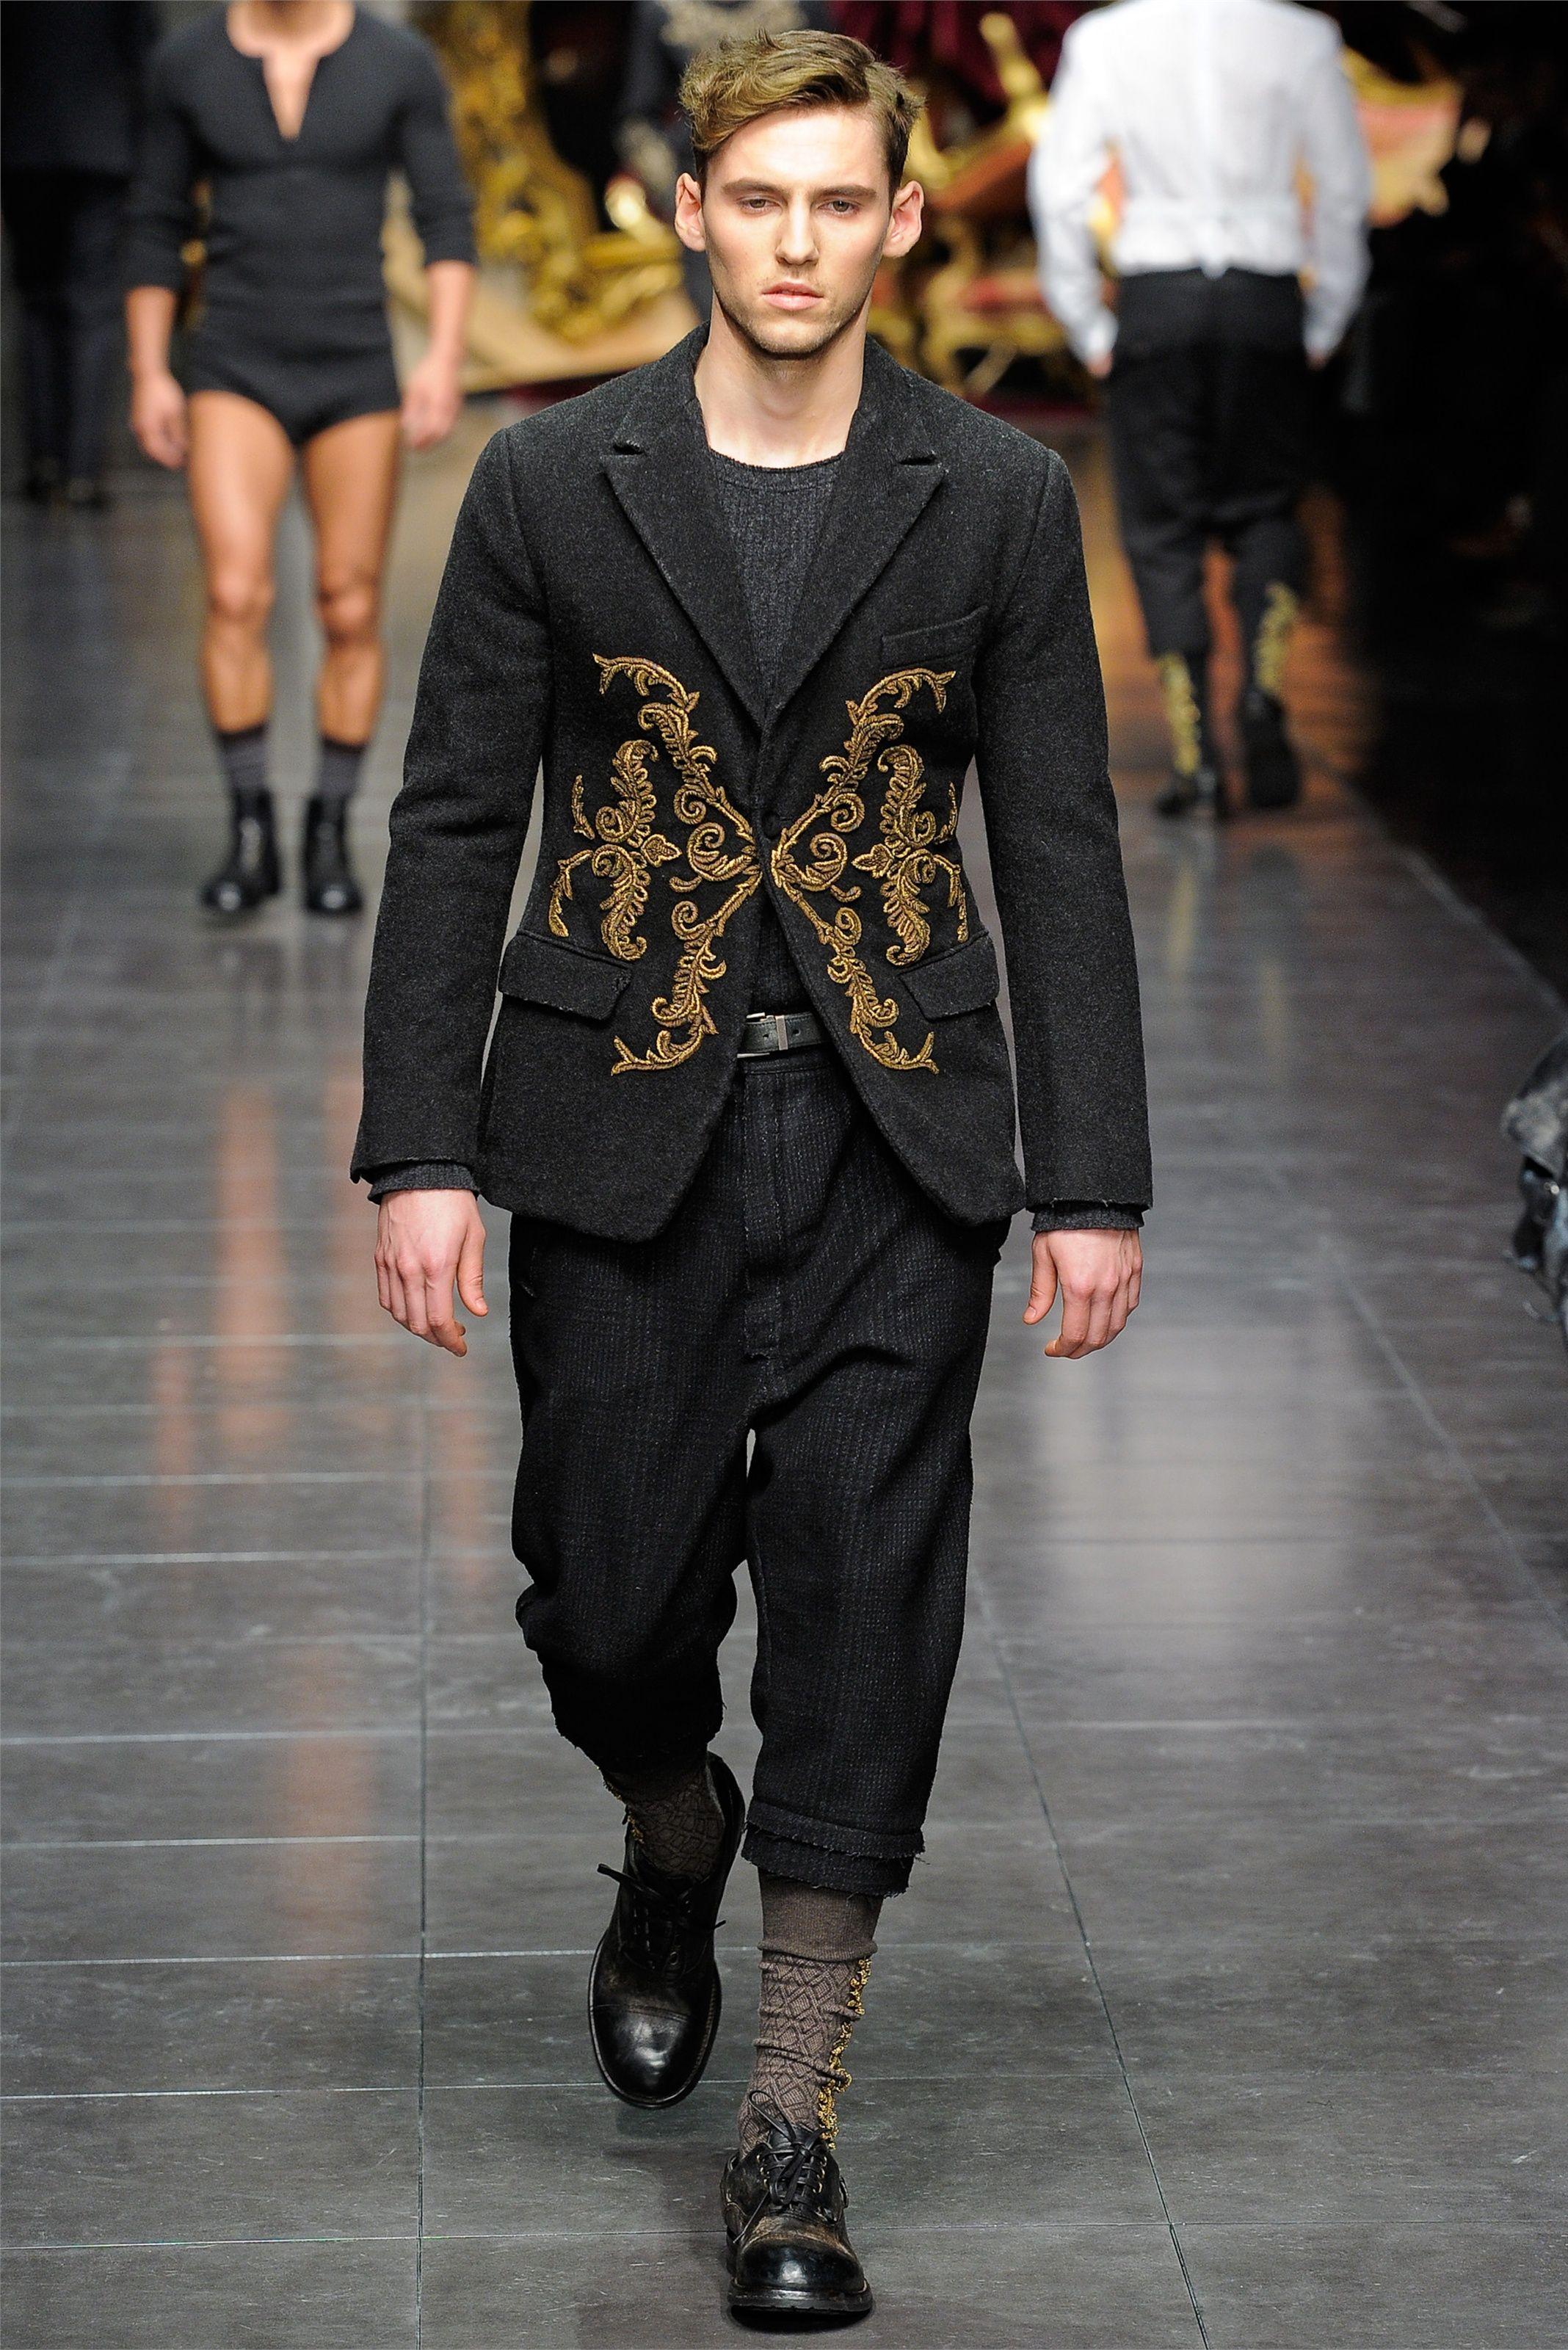 Sfilata Moda Uomo Dolce & Gabbana Milano Autunno Inverno